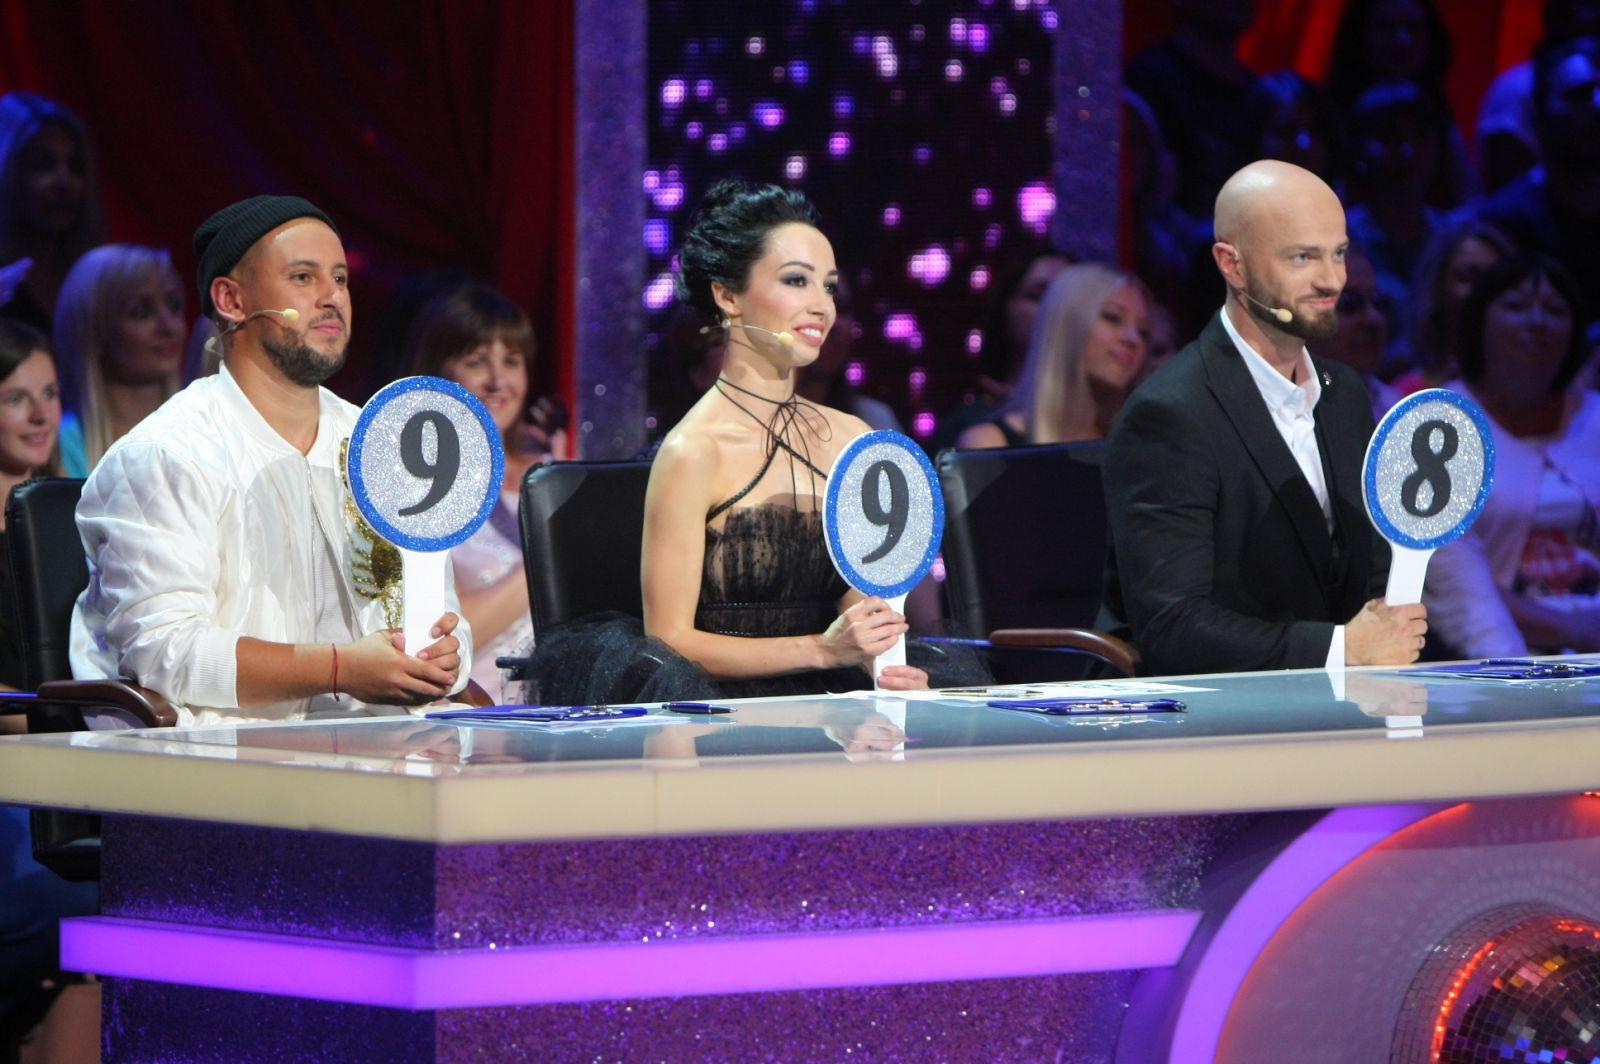 Судьи шоу «Танцы со звездами»: Monatik, Екатерина Кухар и Влад Яма